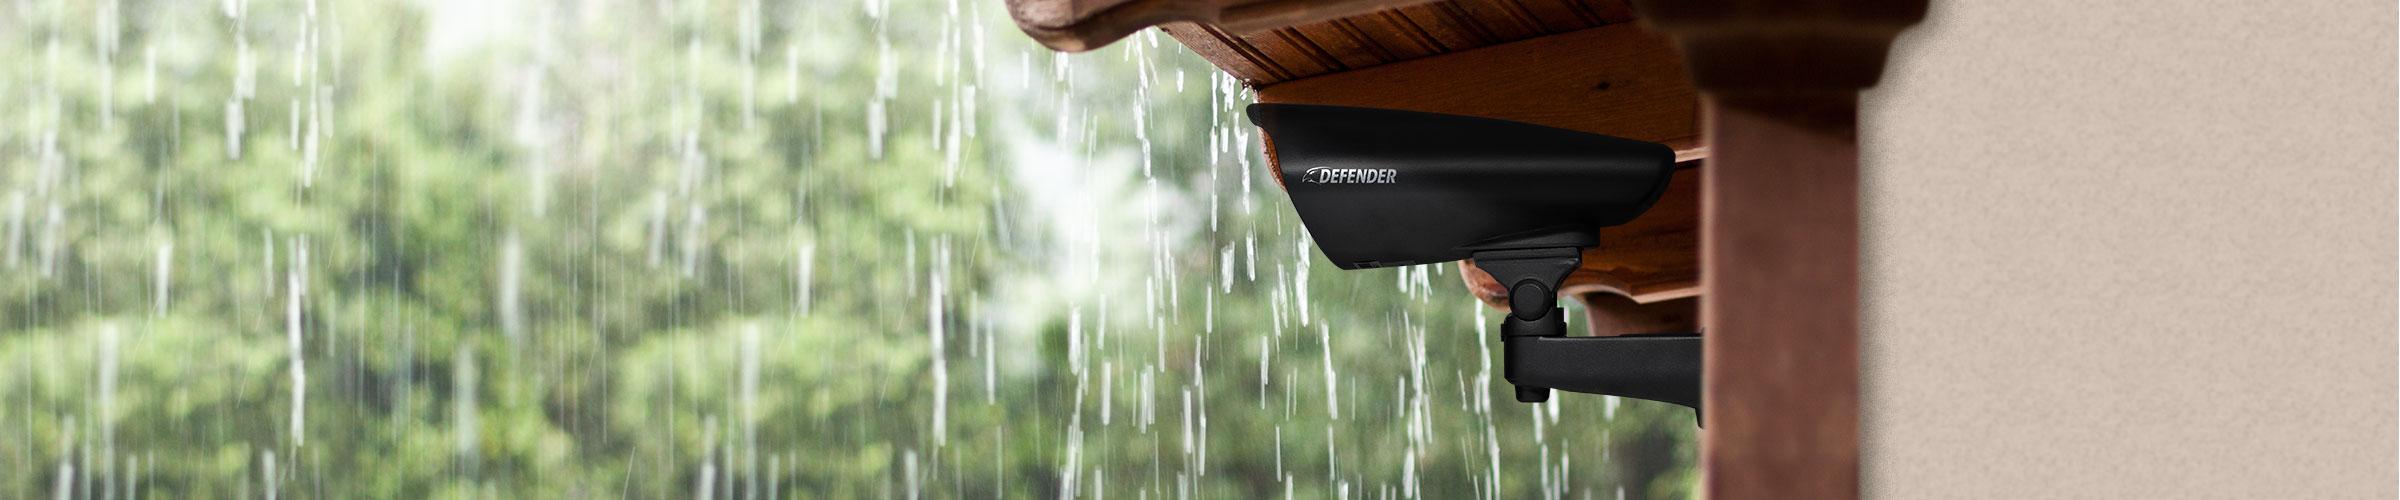 heavy duty weather resistant securitycameras